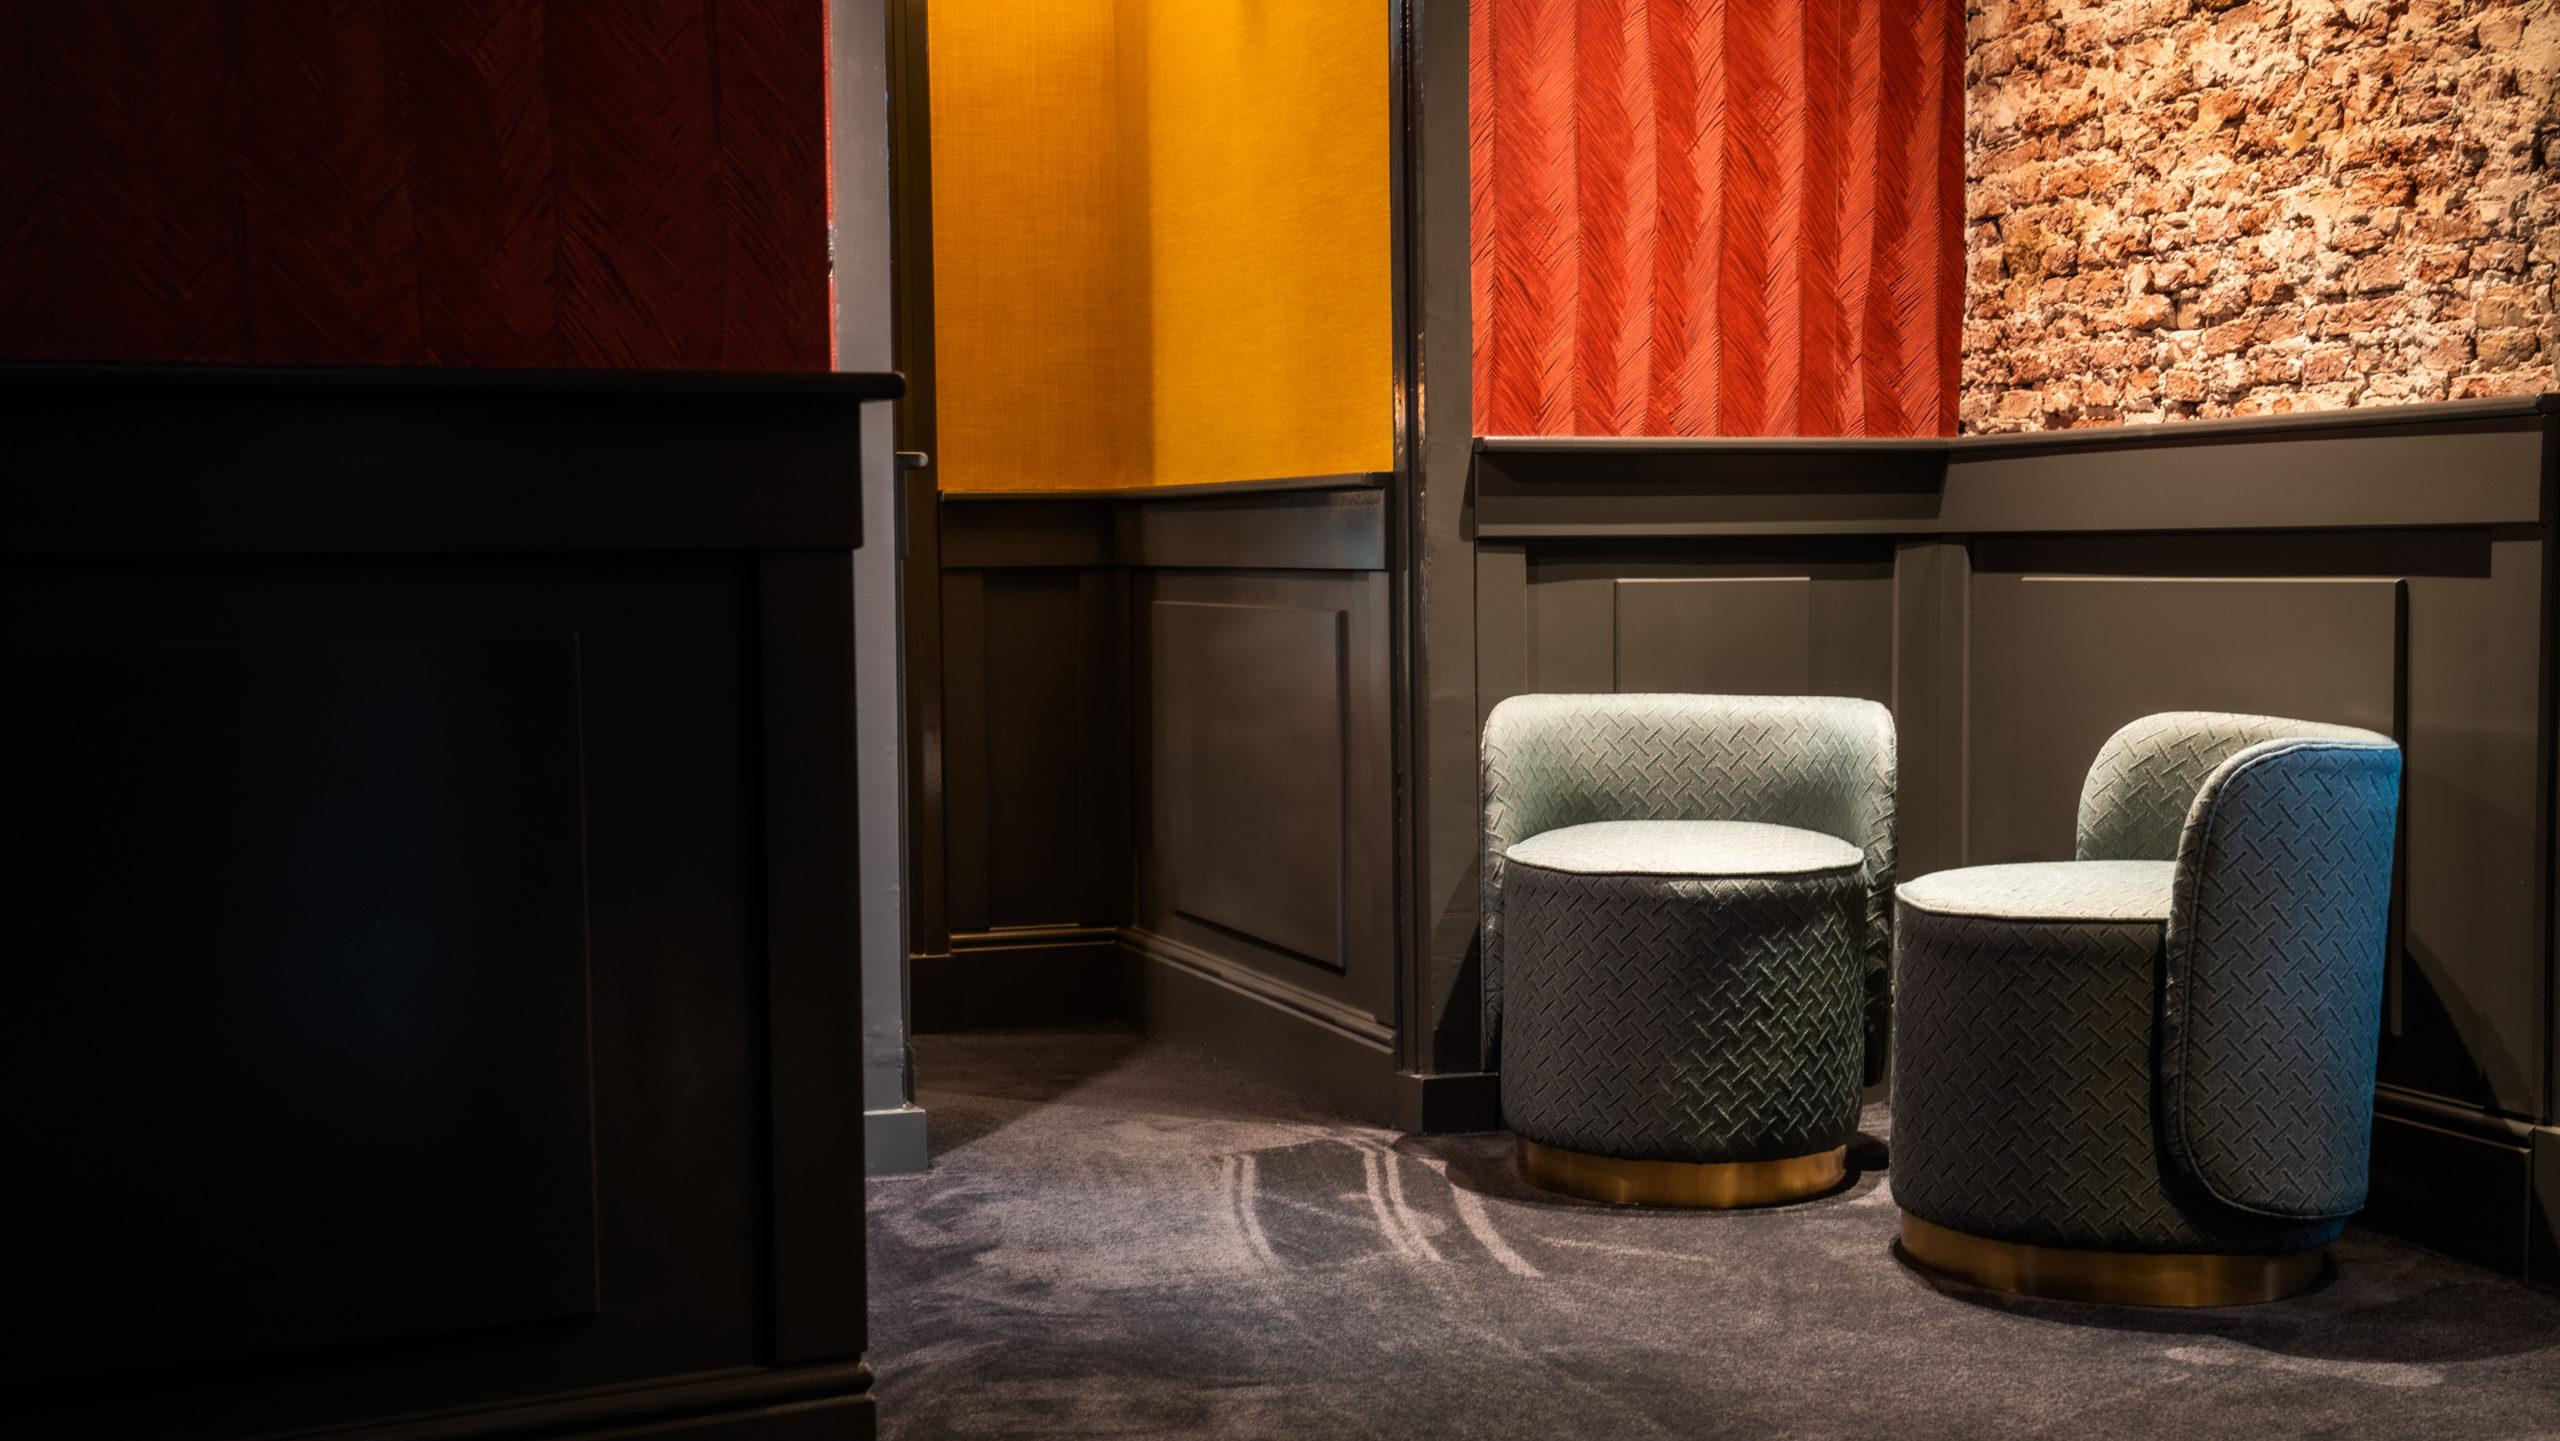 hotel_1666_thorbecke_jeroendenijs_bni_amsterdam_suite_boutique_hallway